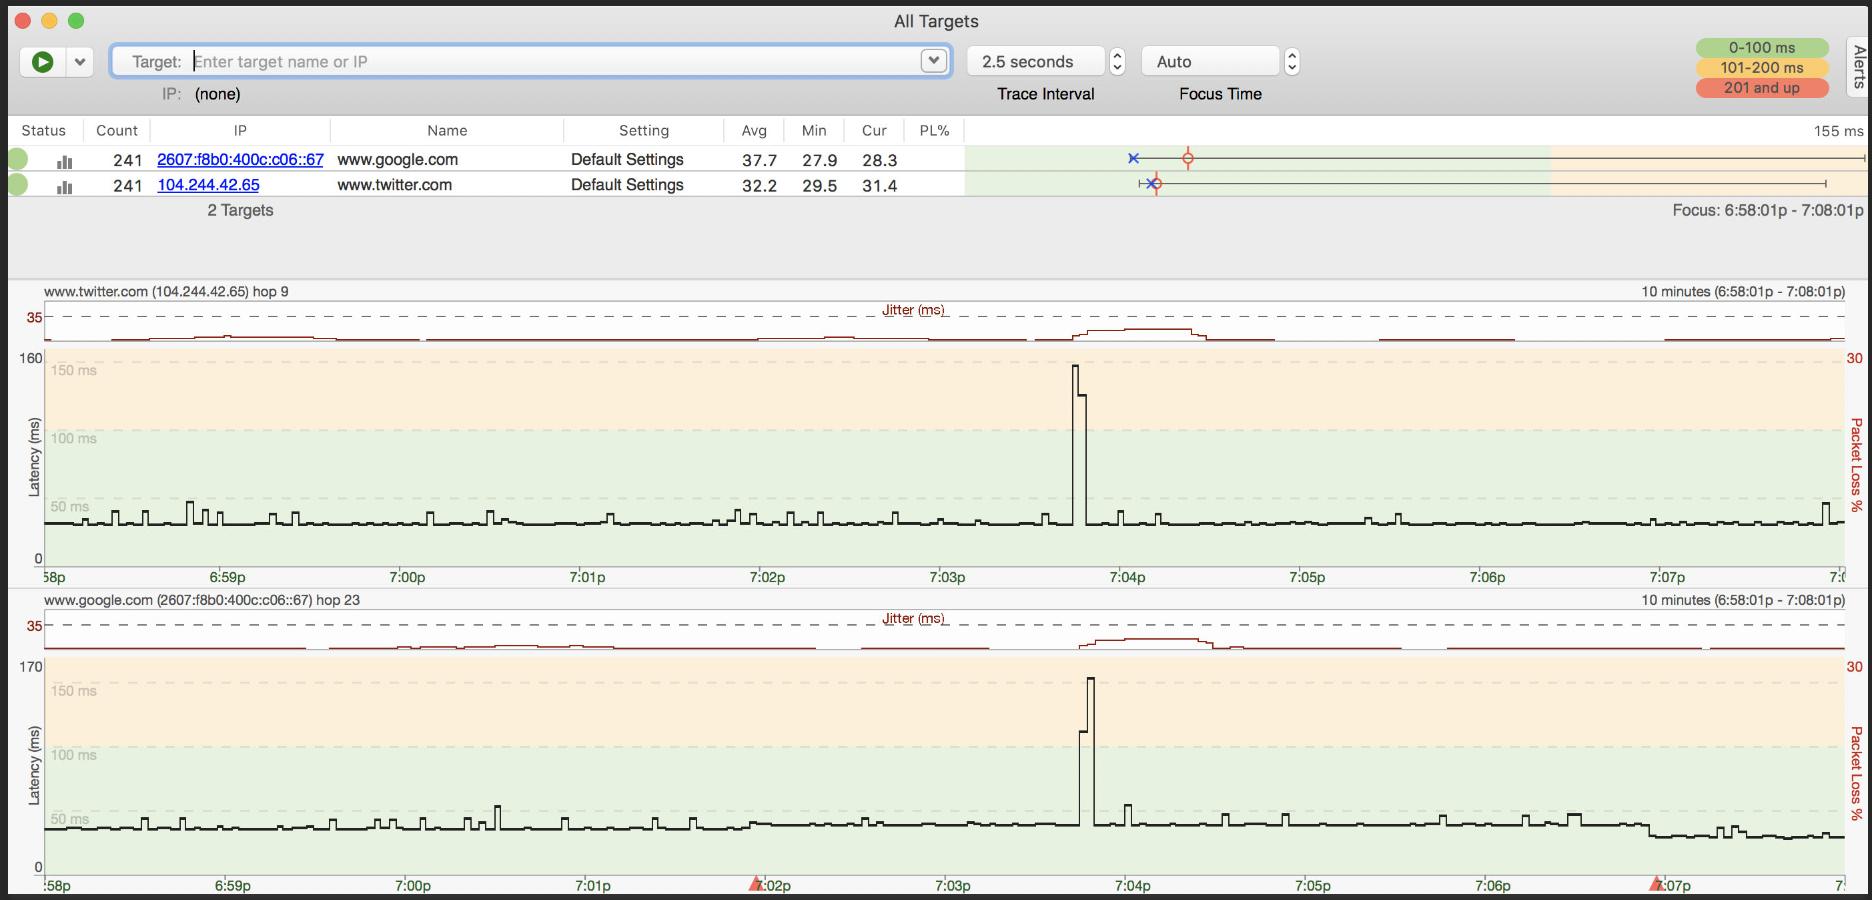 xr500 one month later - DumaOS on NETGEAR Nighthawk Support